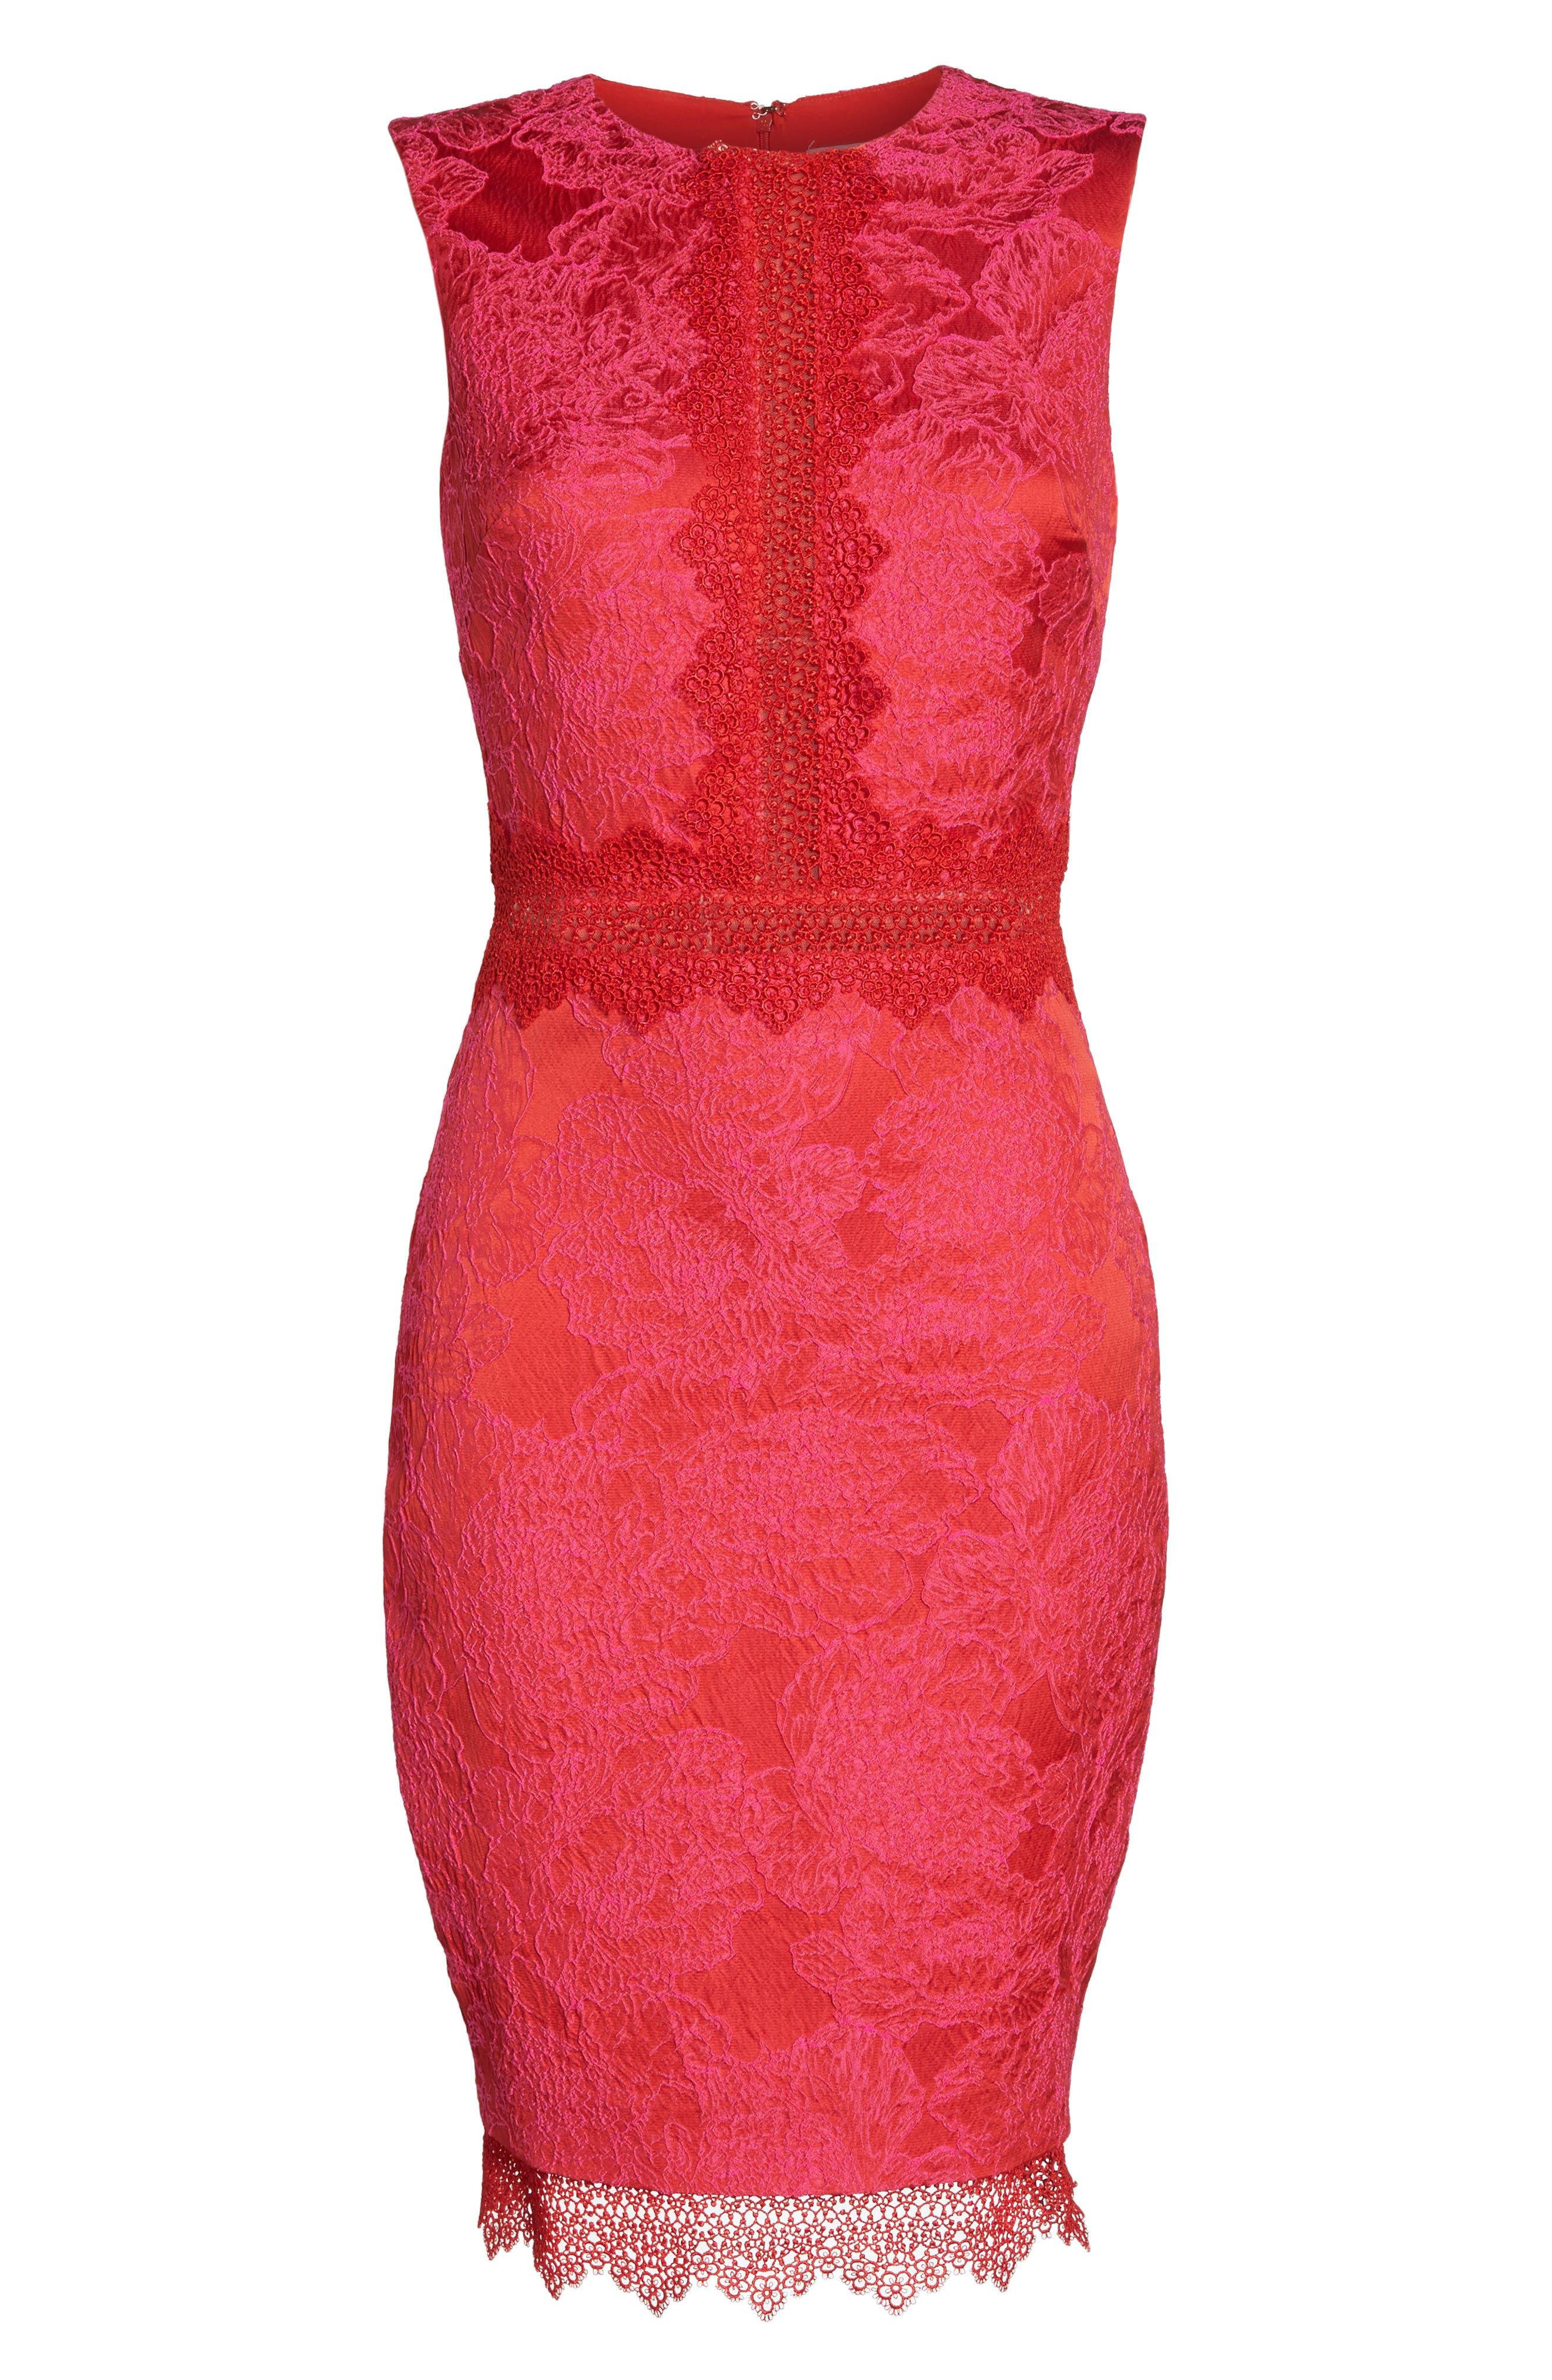 Lace Panel Sheath Dress,                             Alternate thumbnail 6, color,                             Red Multi